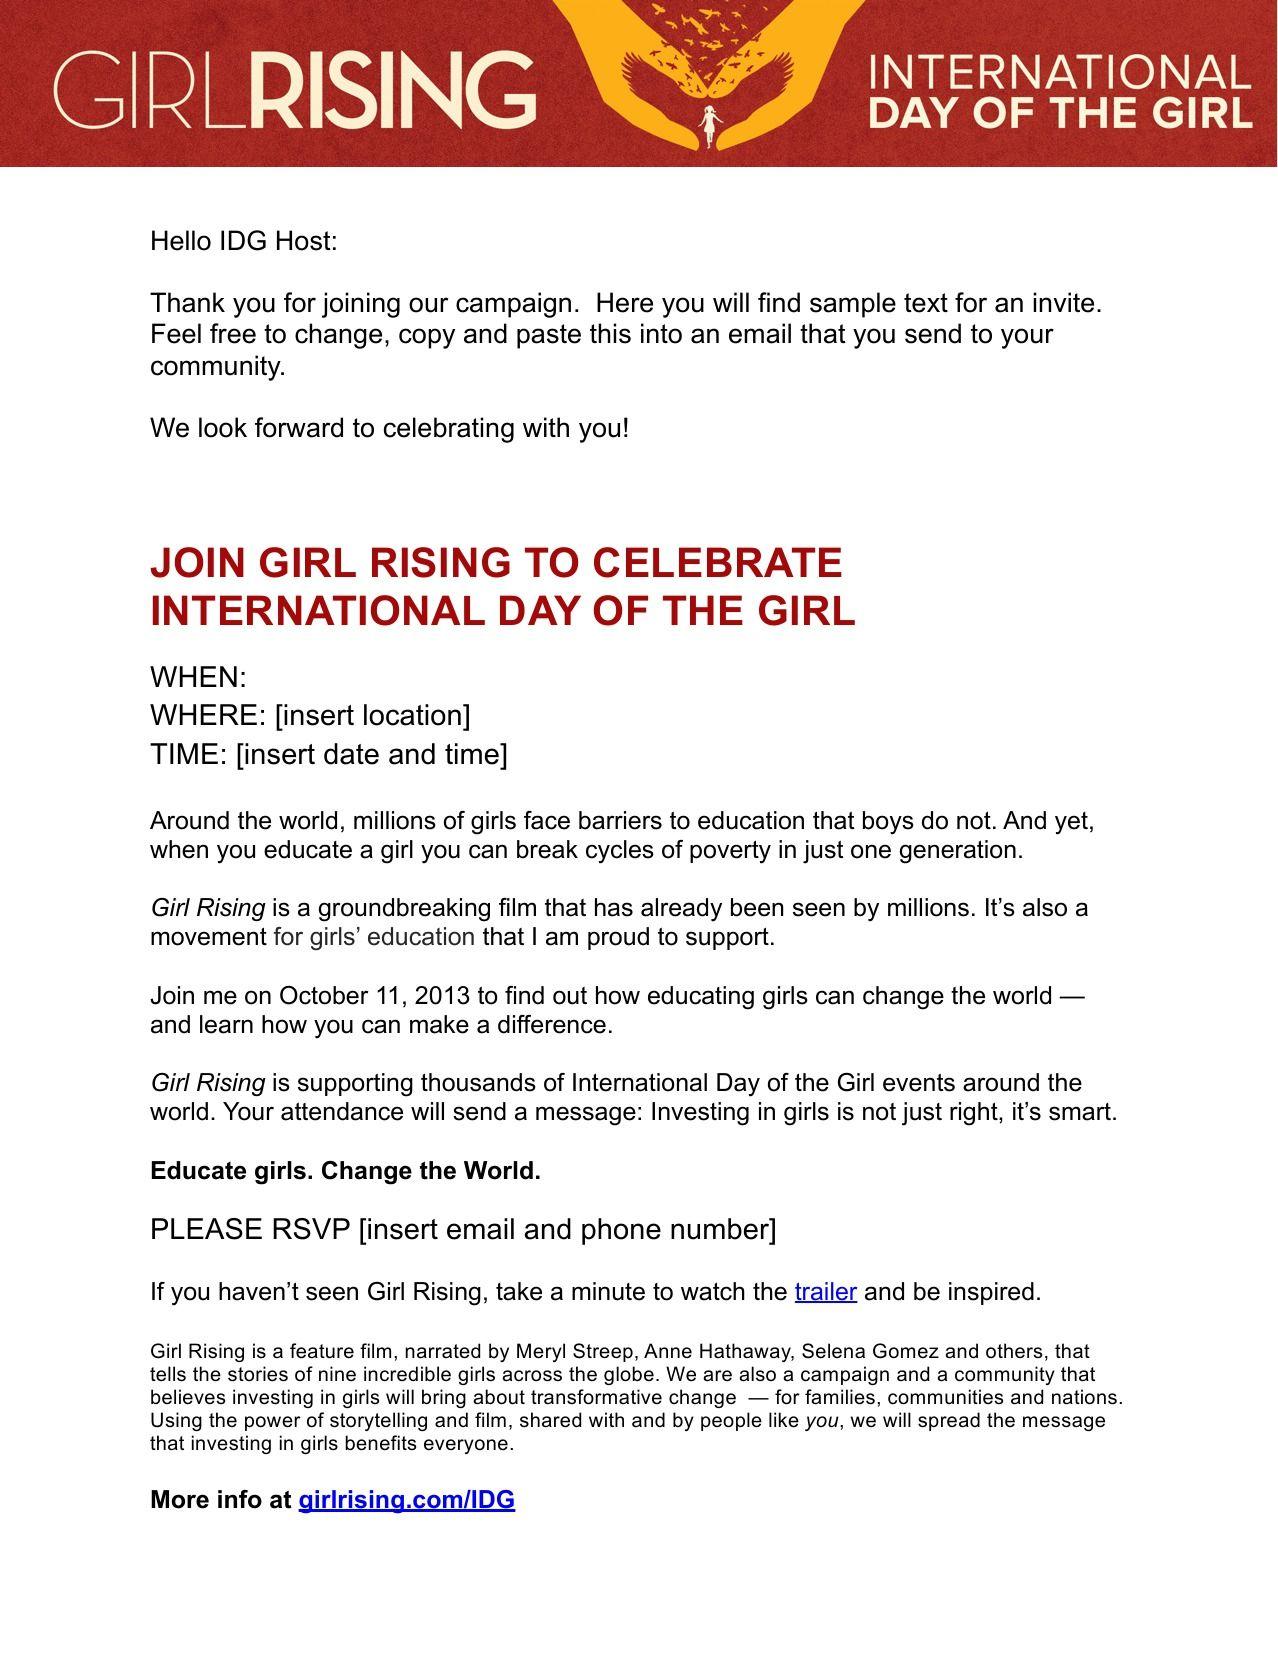 Email Invite Template  Clean Invitations    Email Invites